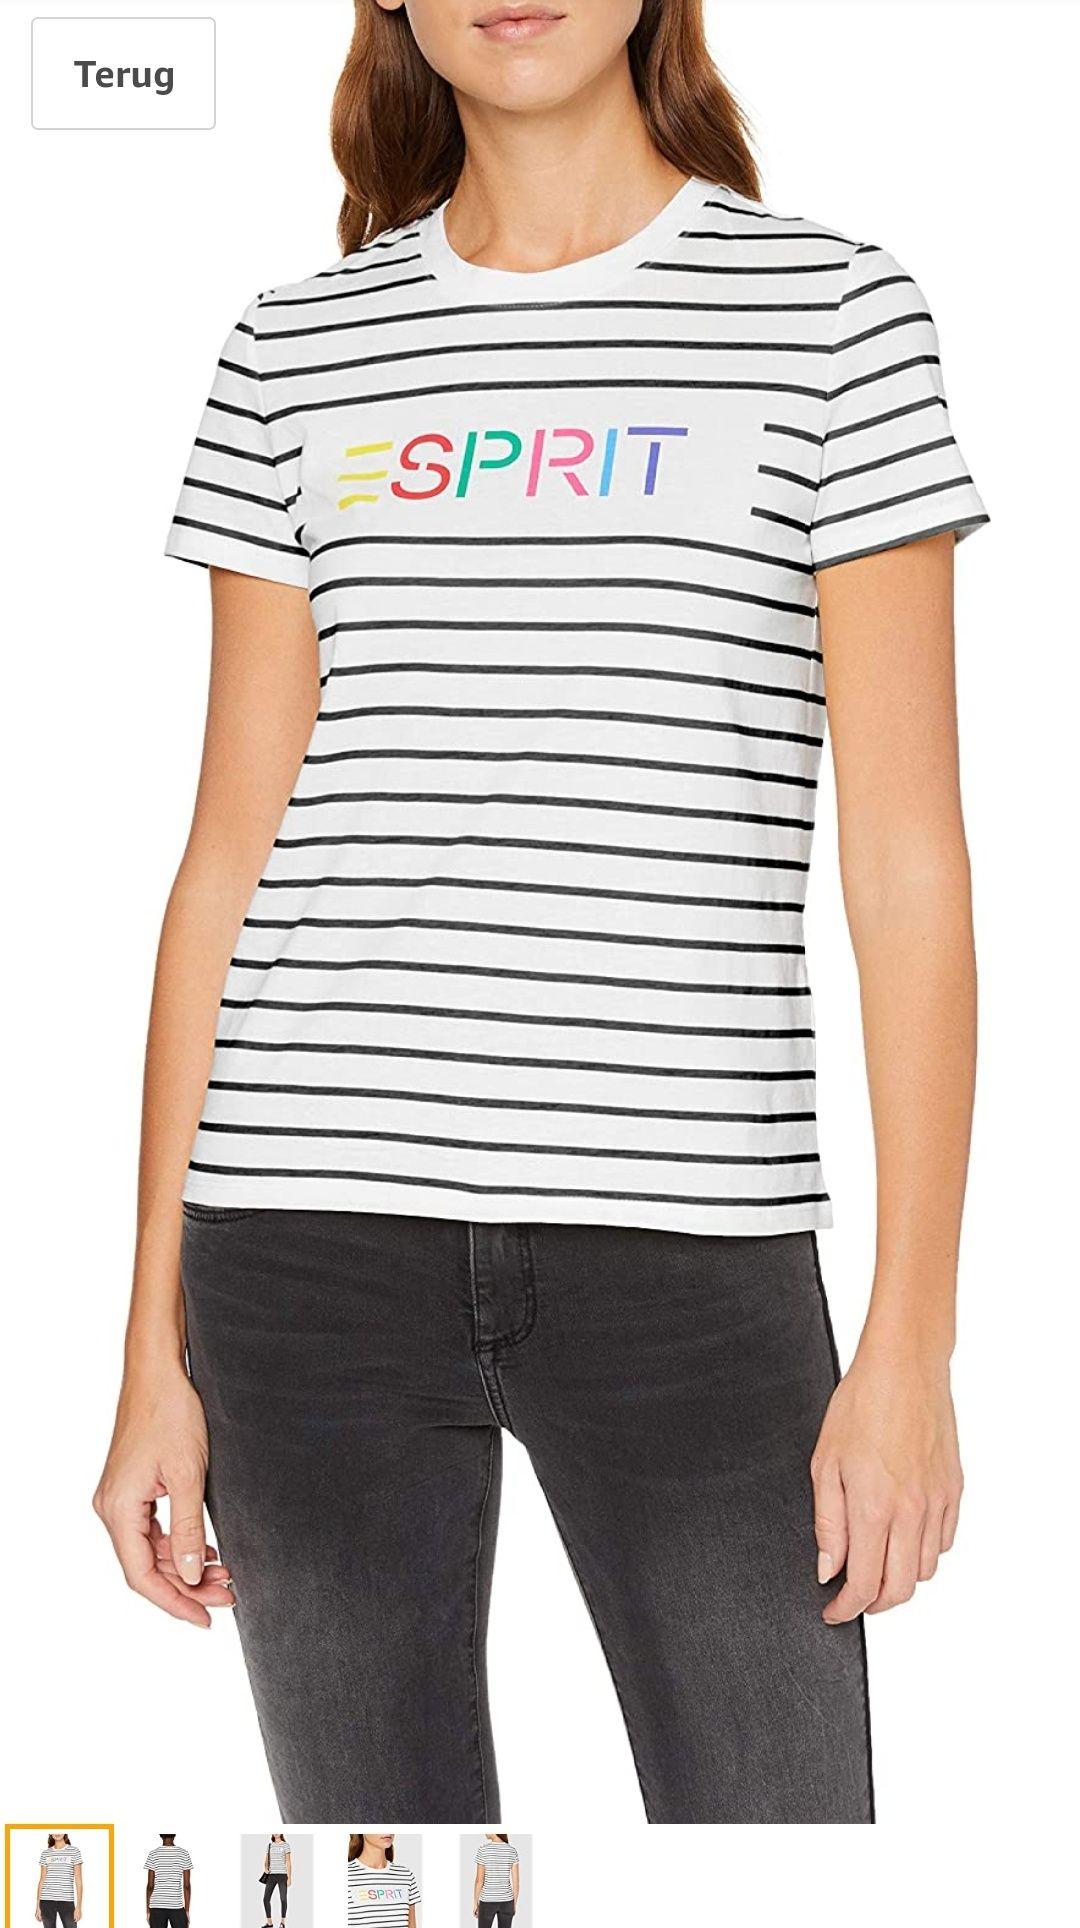 Esprit dames T-shirt alleen nog maat M